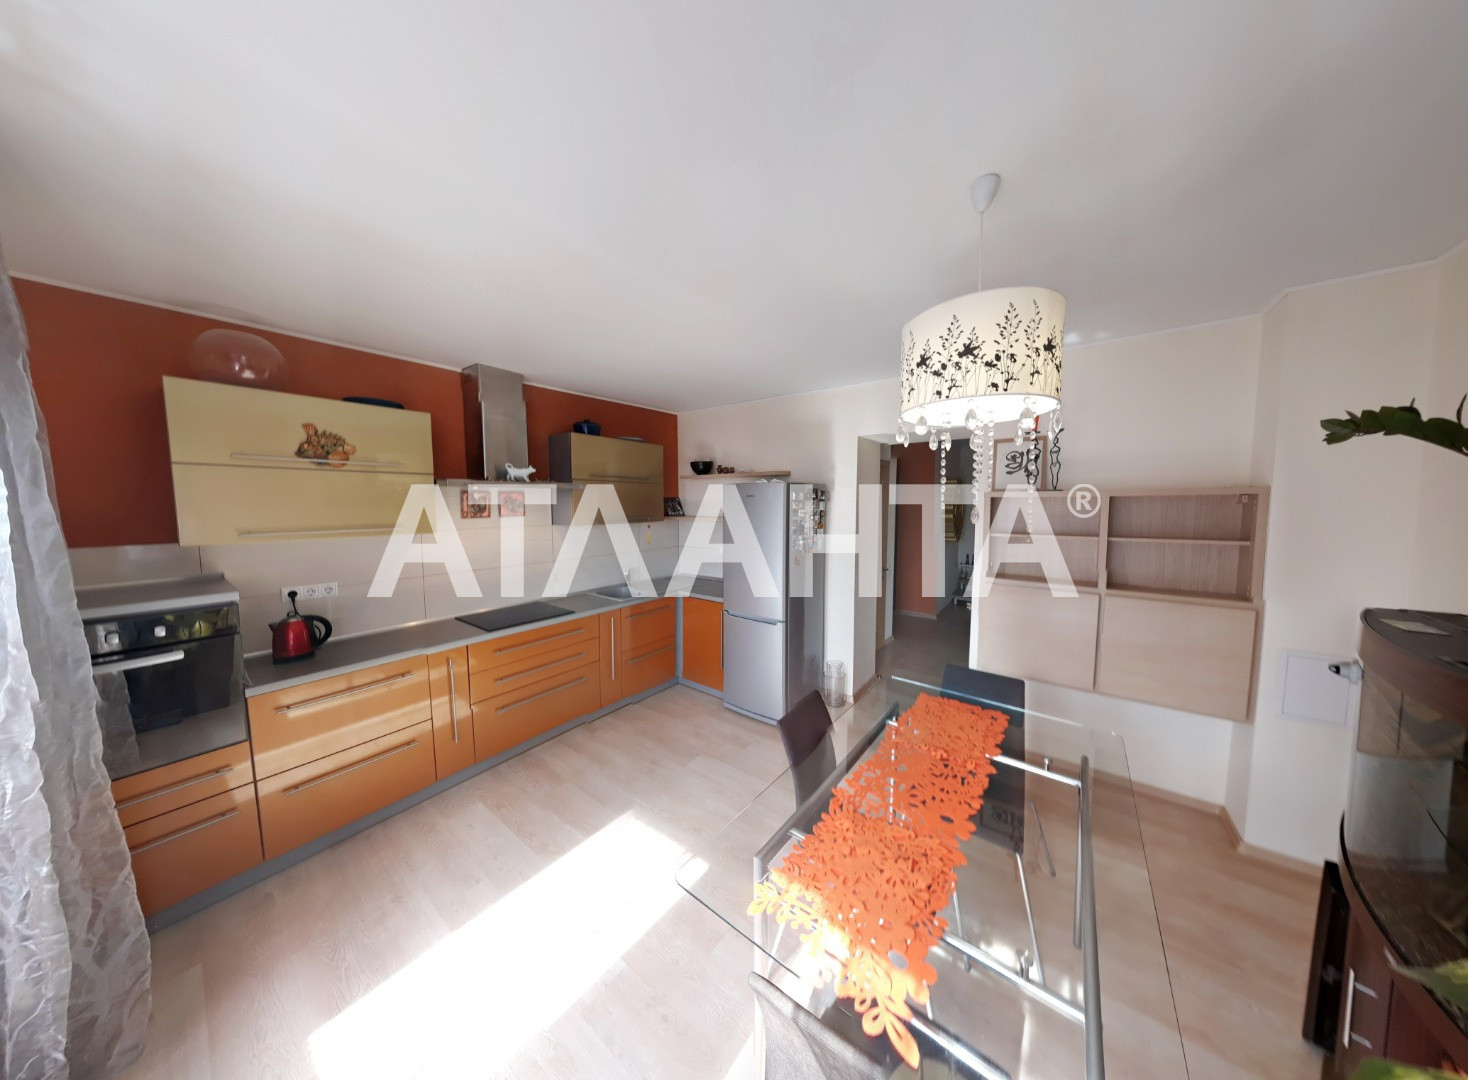 Продается 3-комнатная Квартира на ул. Ломоносова — 118 900 у.е.